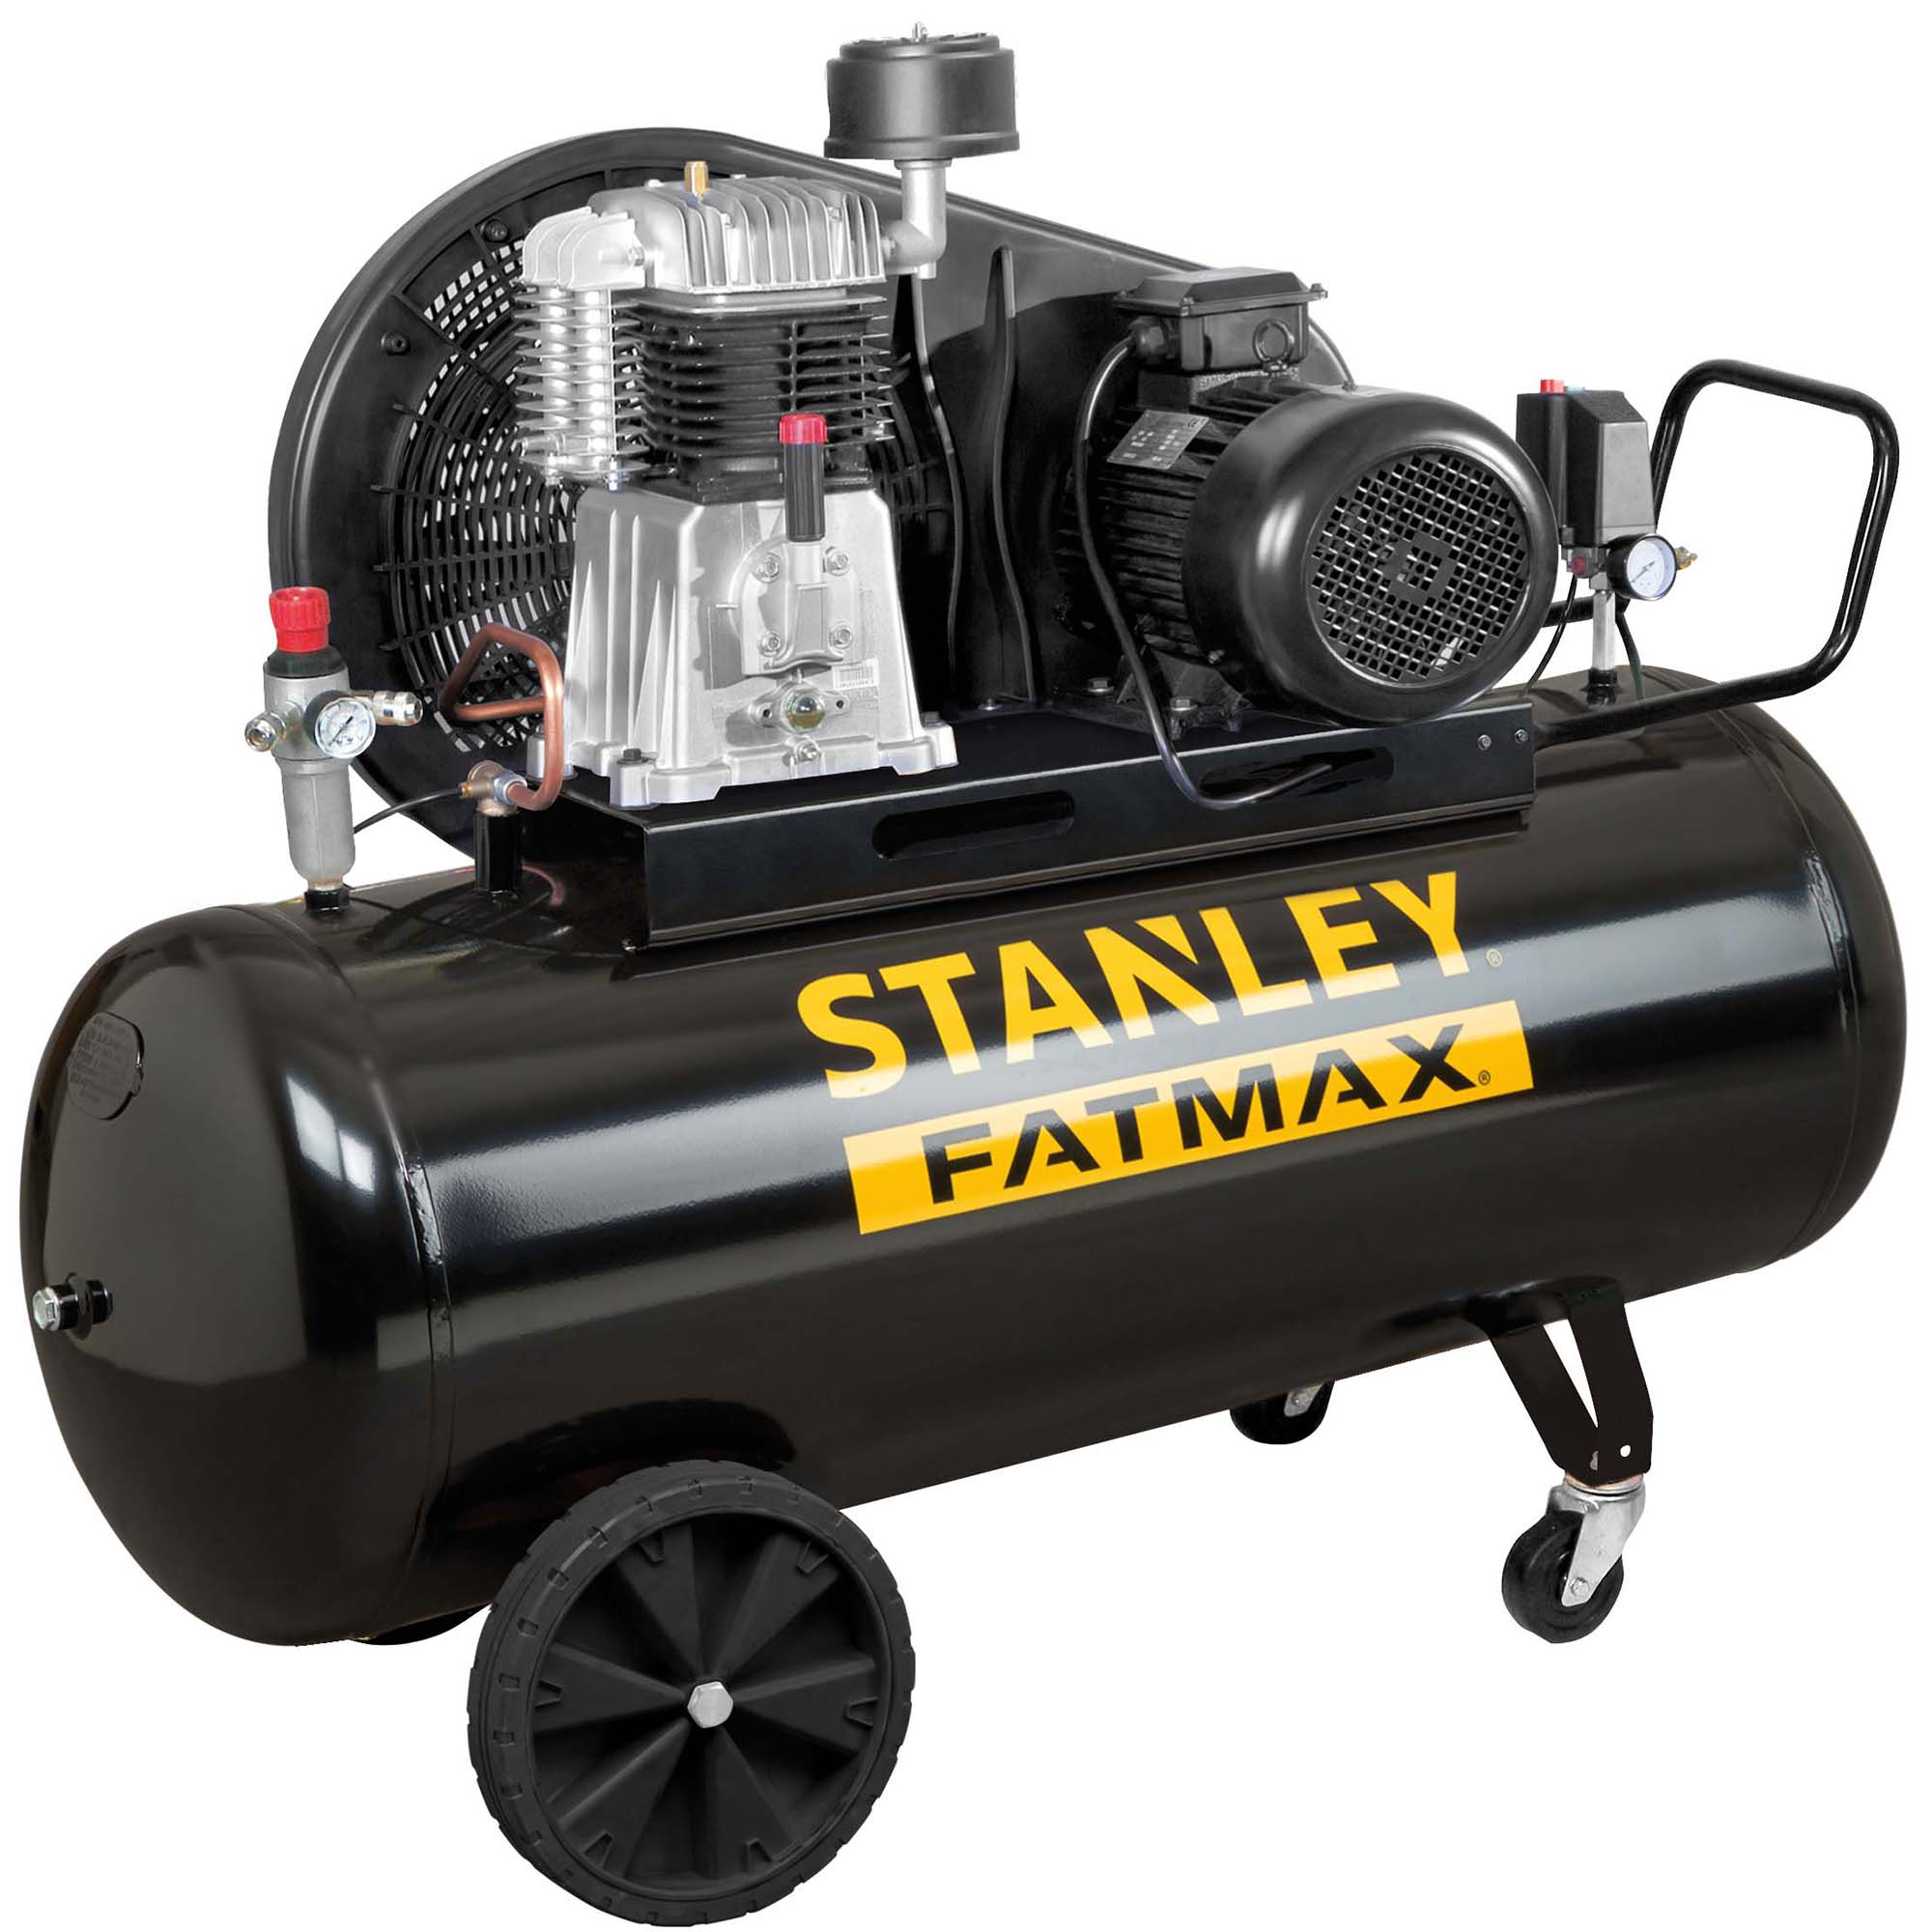 Fotografie Compresor de aer profesional Stanley FatMax, 270l, 5.5CP, 11bar, 640l/m